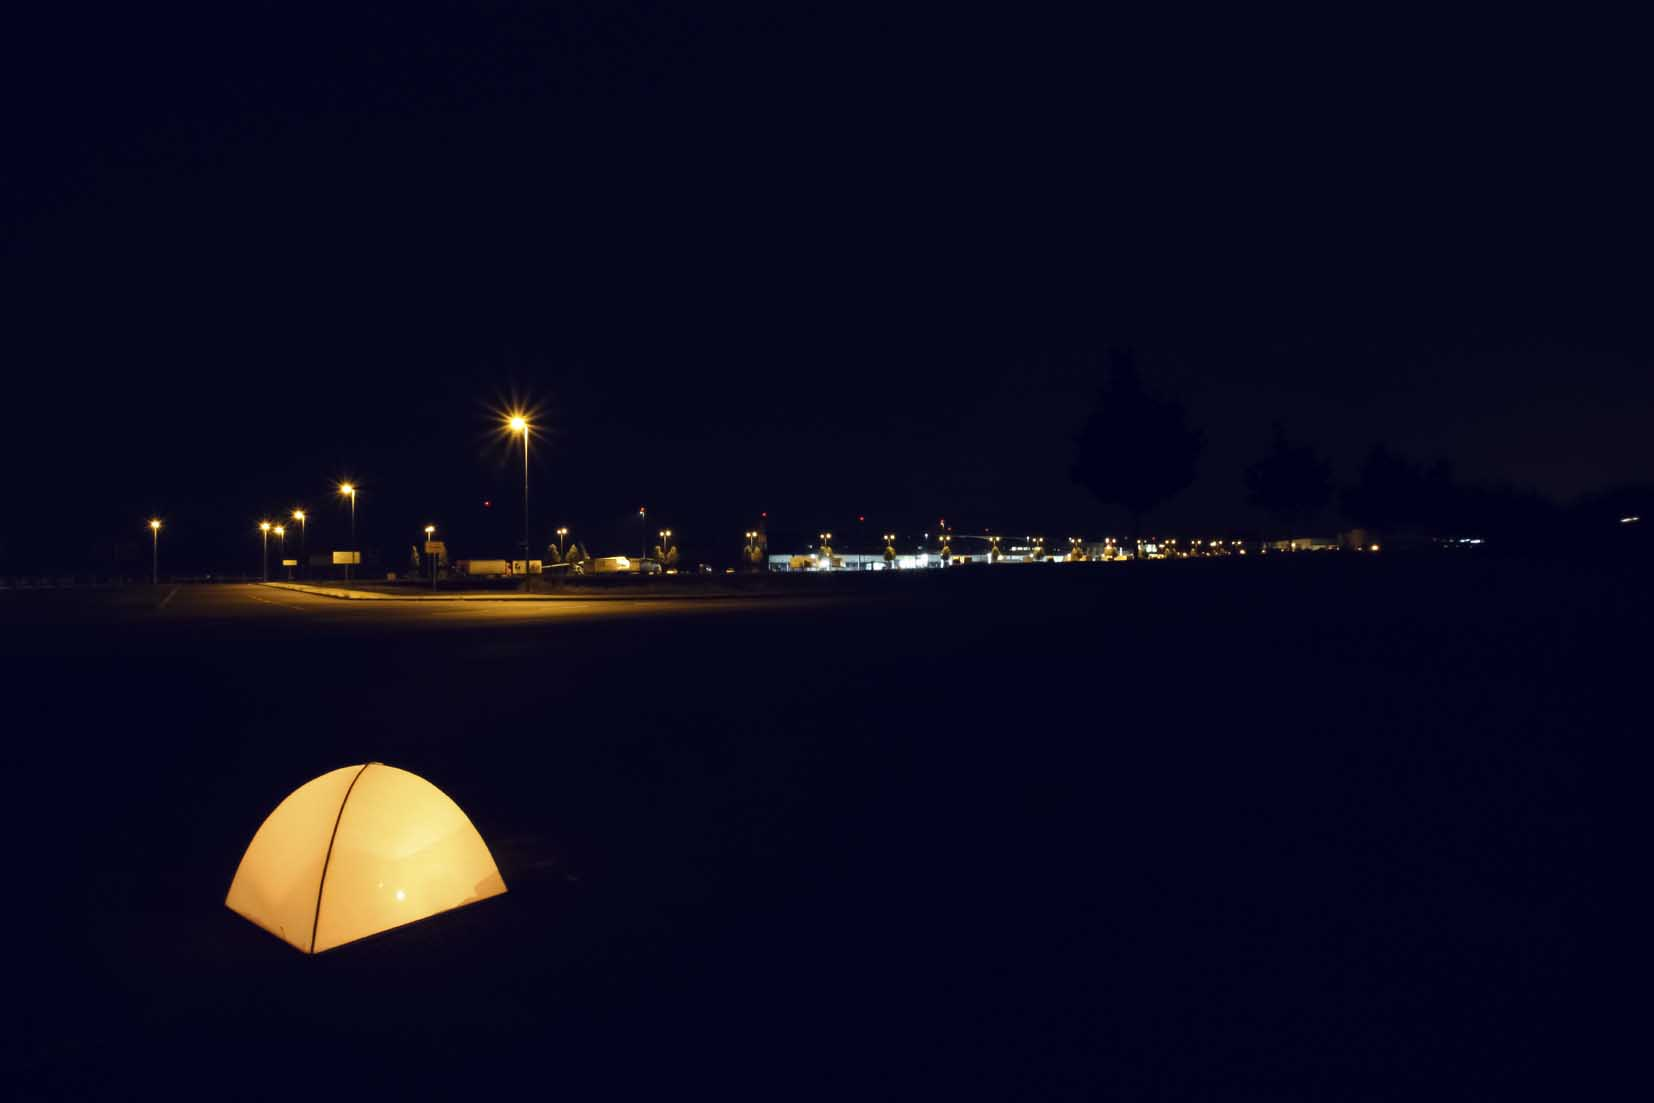 Nachtstück